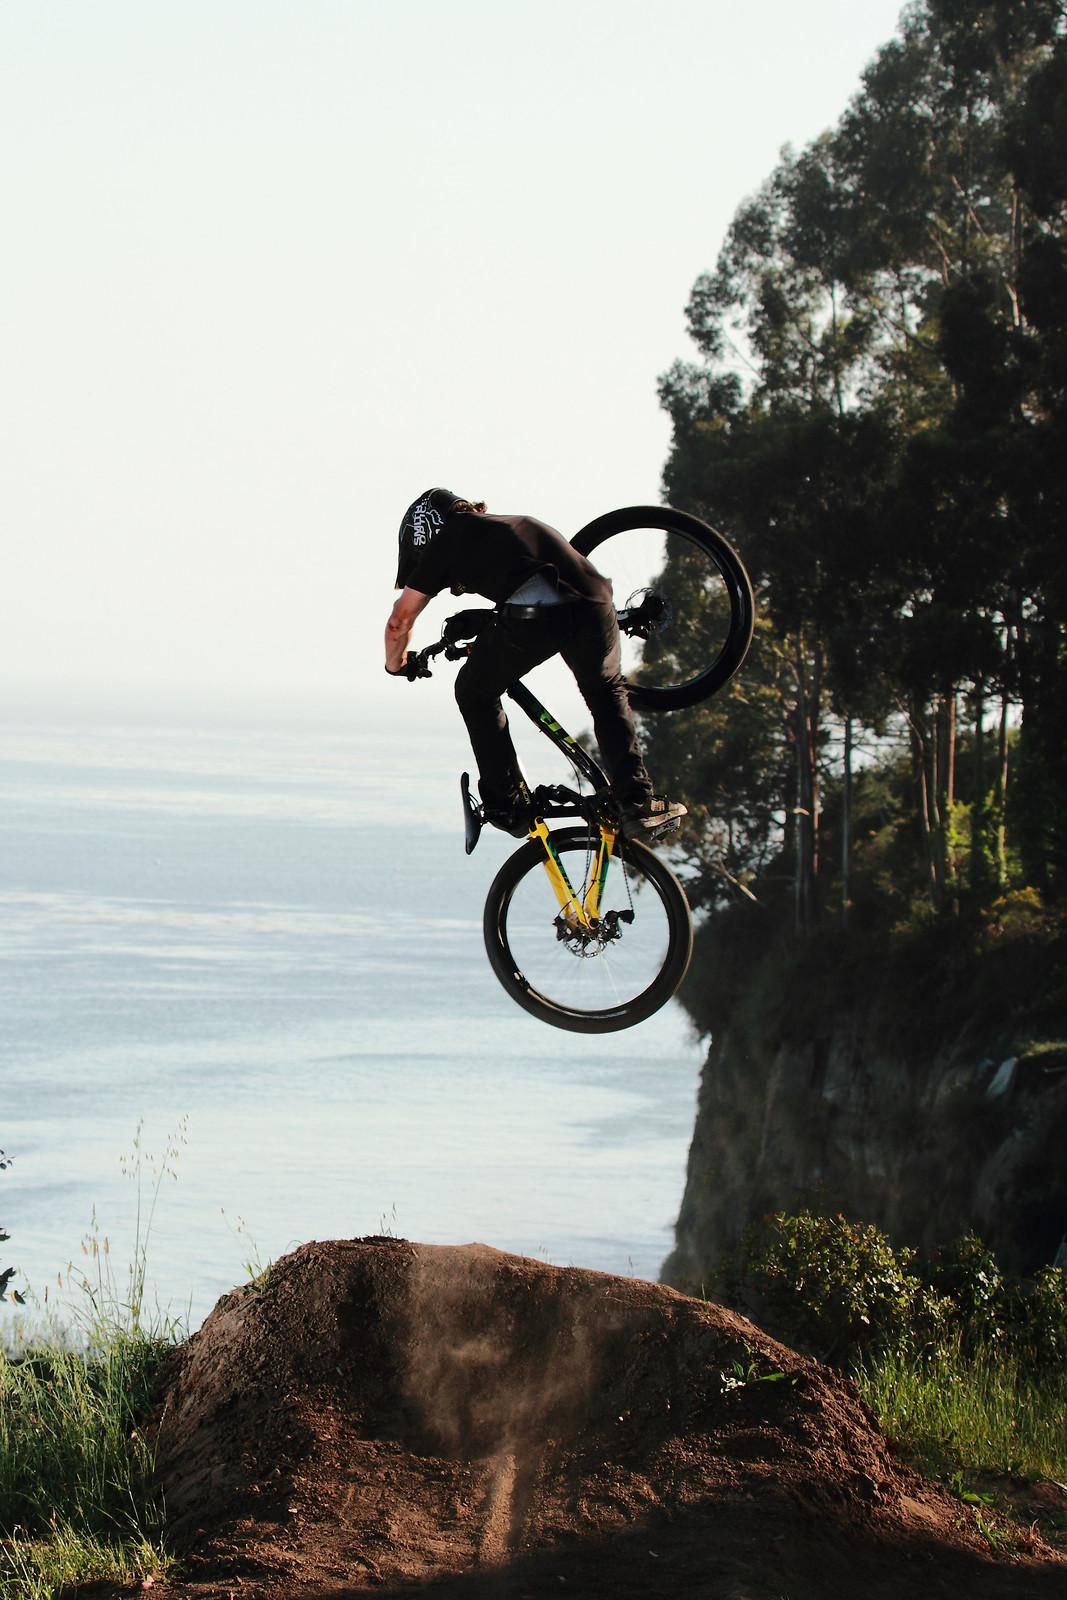 Cam McCaul Invert Table  - JTalatzko - Mountain Biking Pictures - Vital MTB